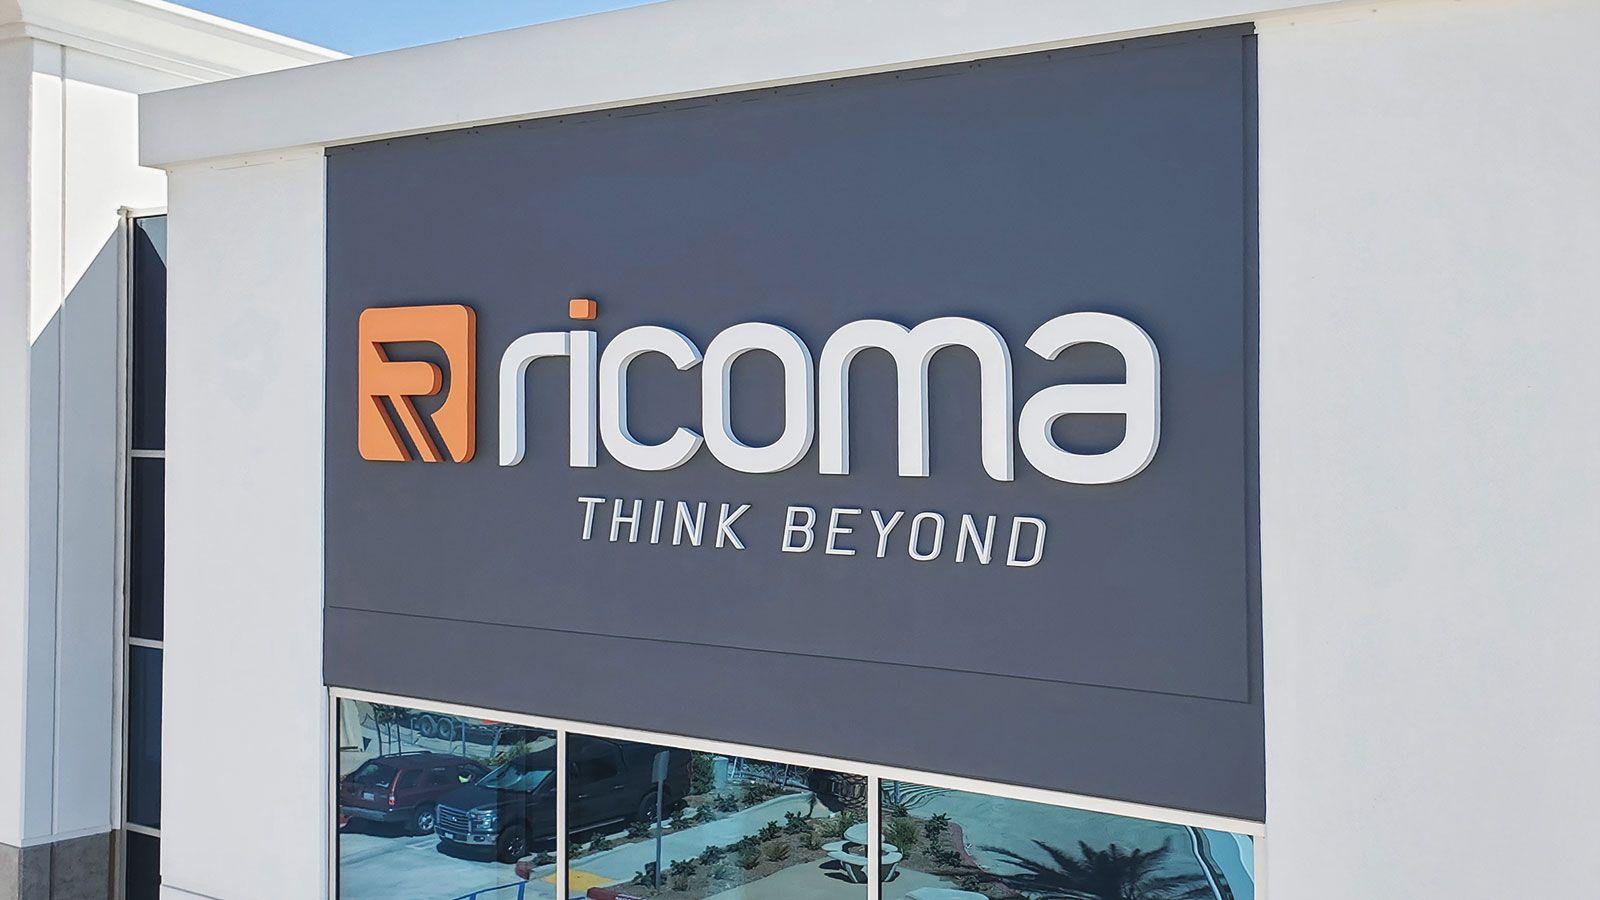 Ricoma building signs